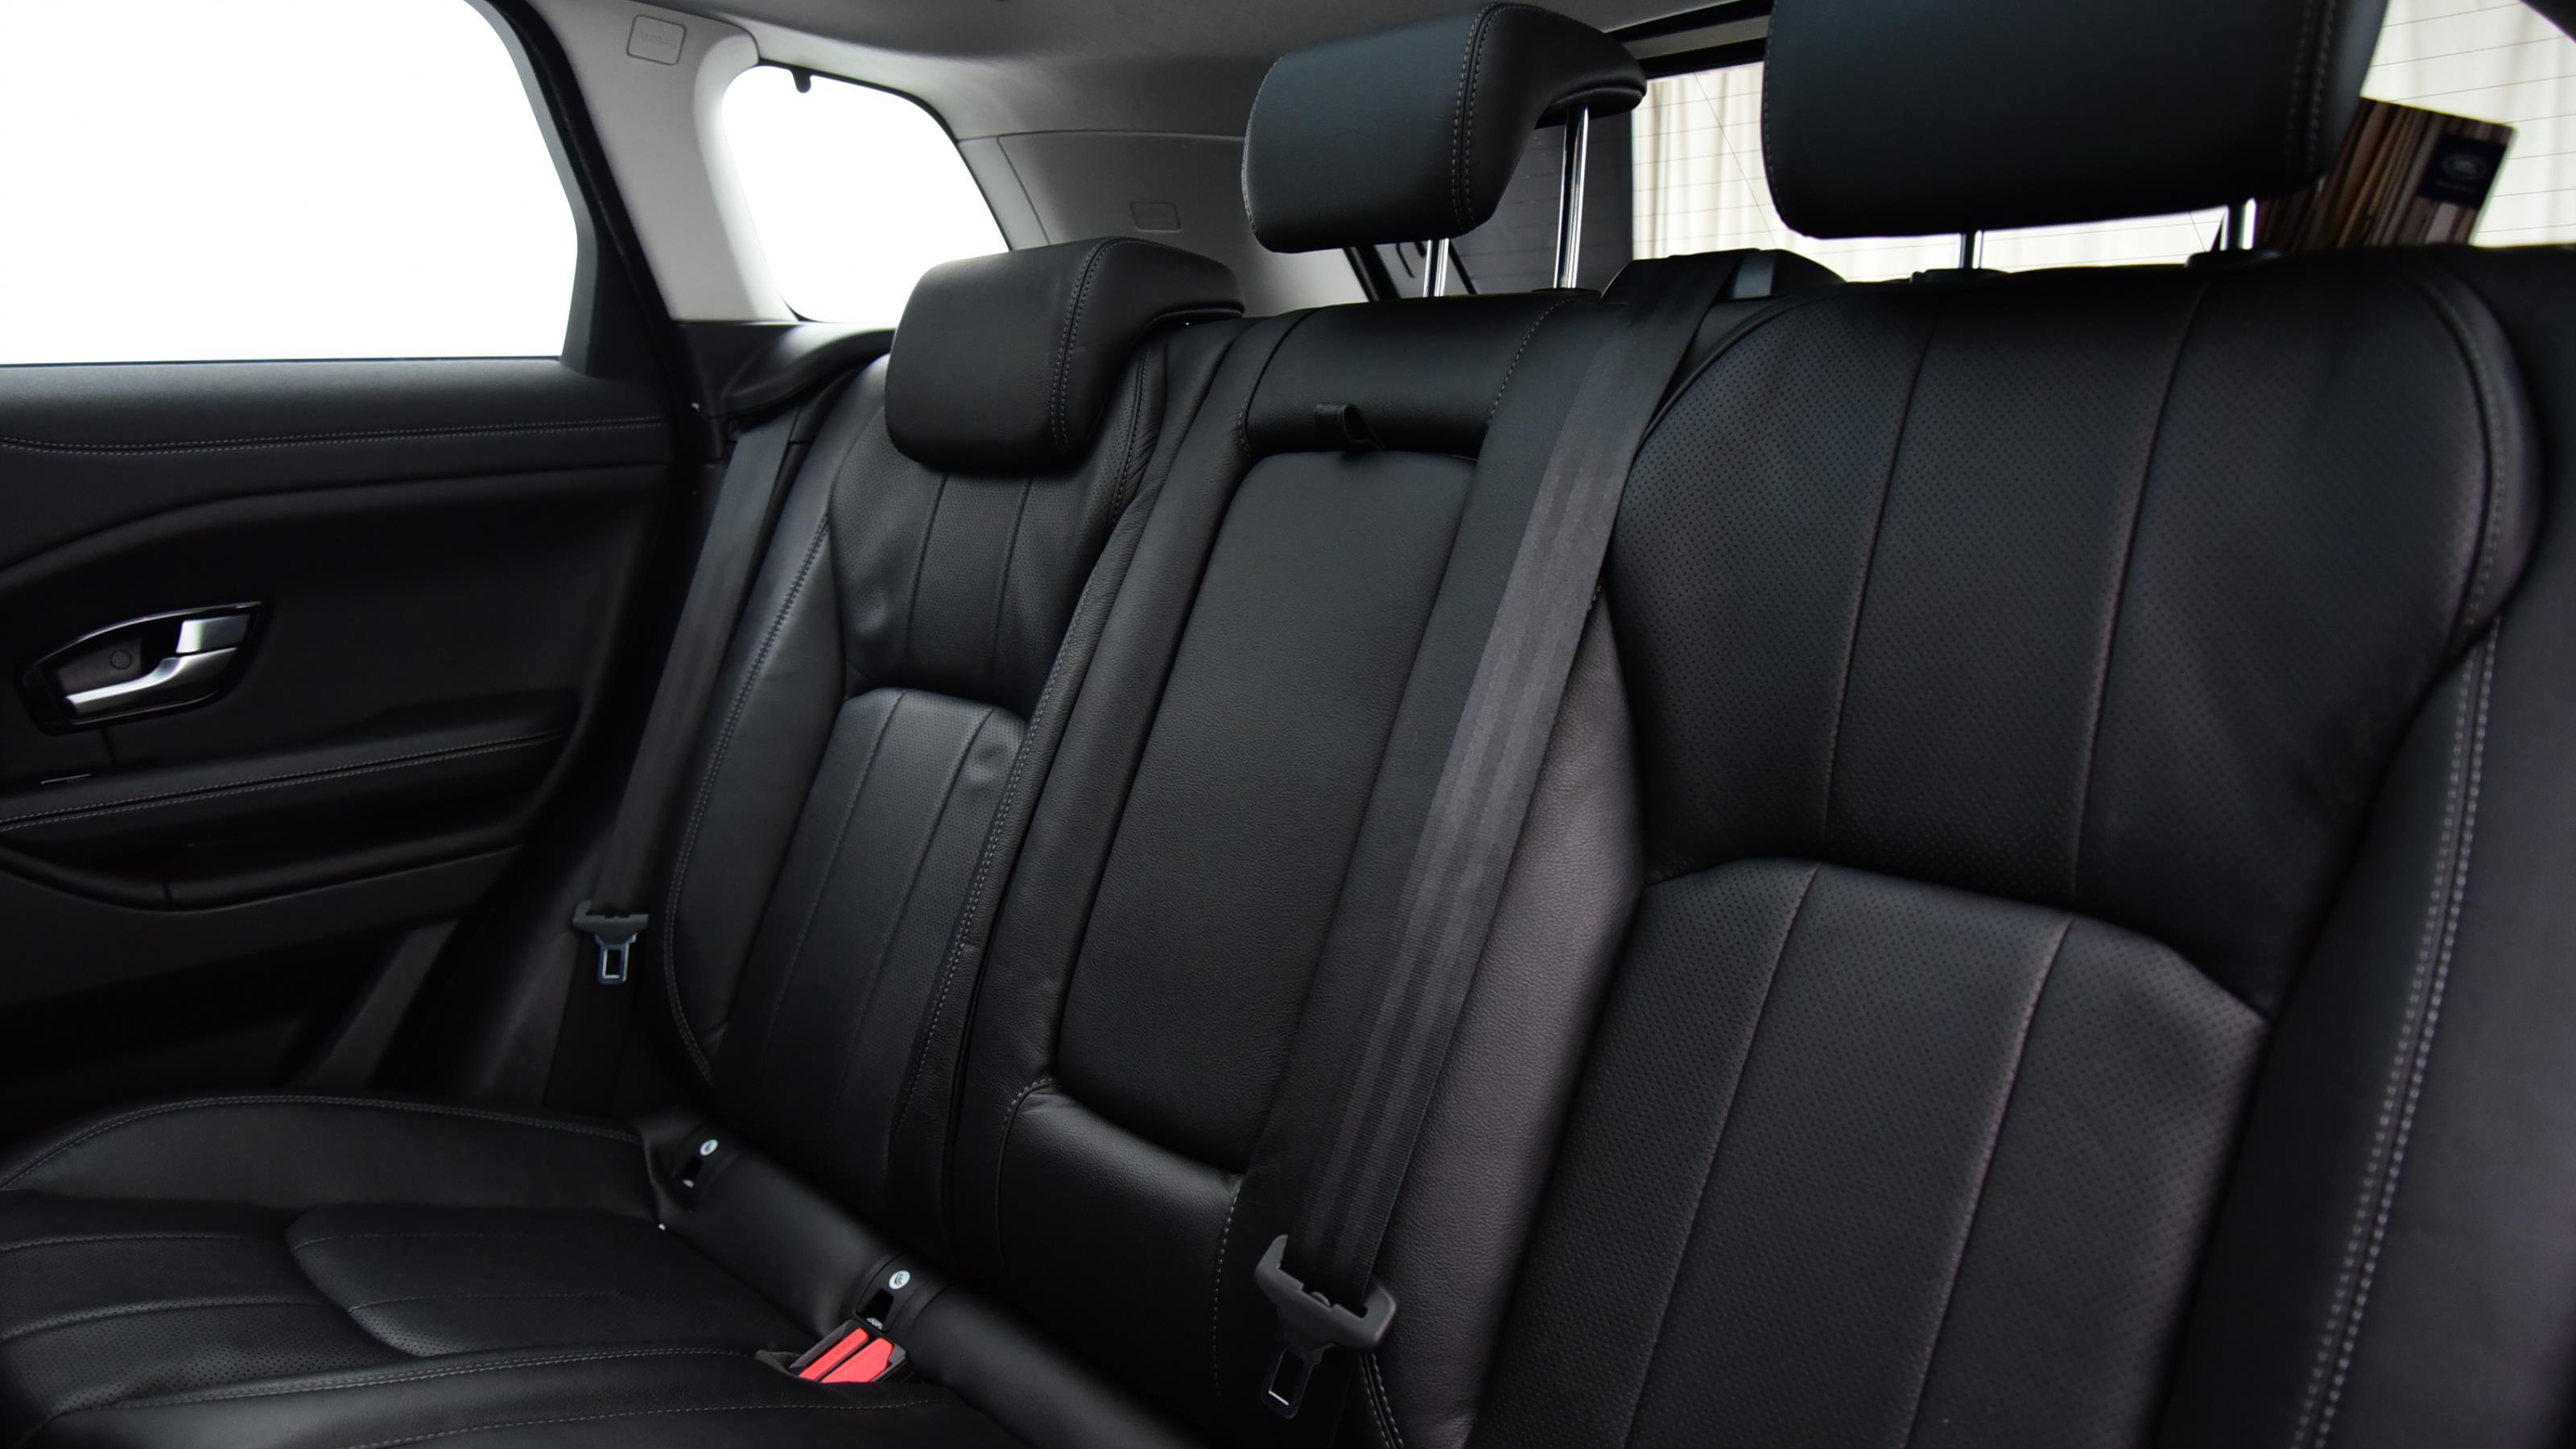 Used 16 Land Rover RANGE ROVER EVOQUE 2.0 TD4 SE Tech 5dr Auto Grey at Saxton4x4